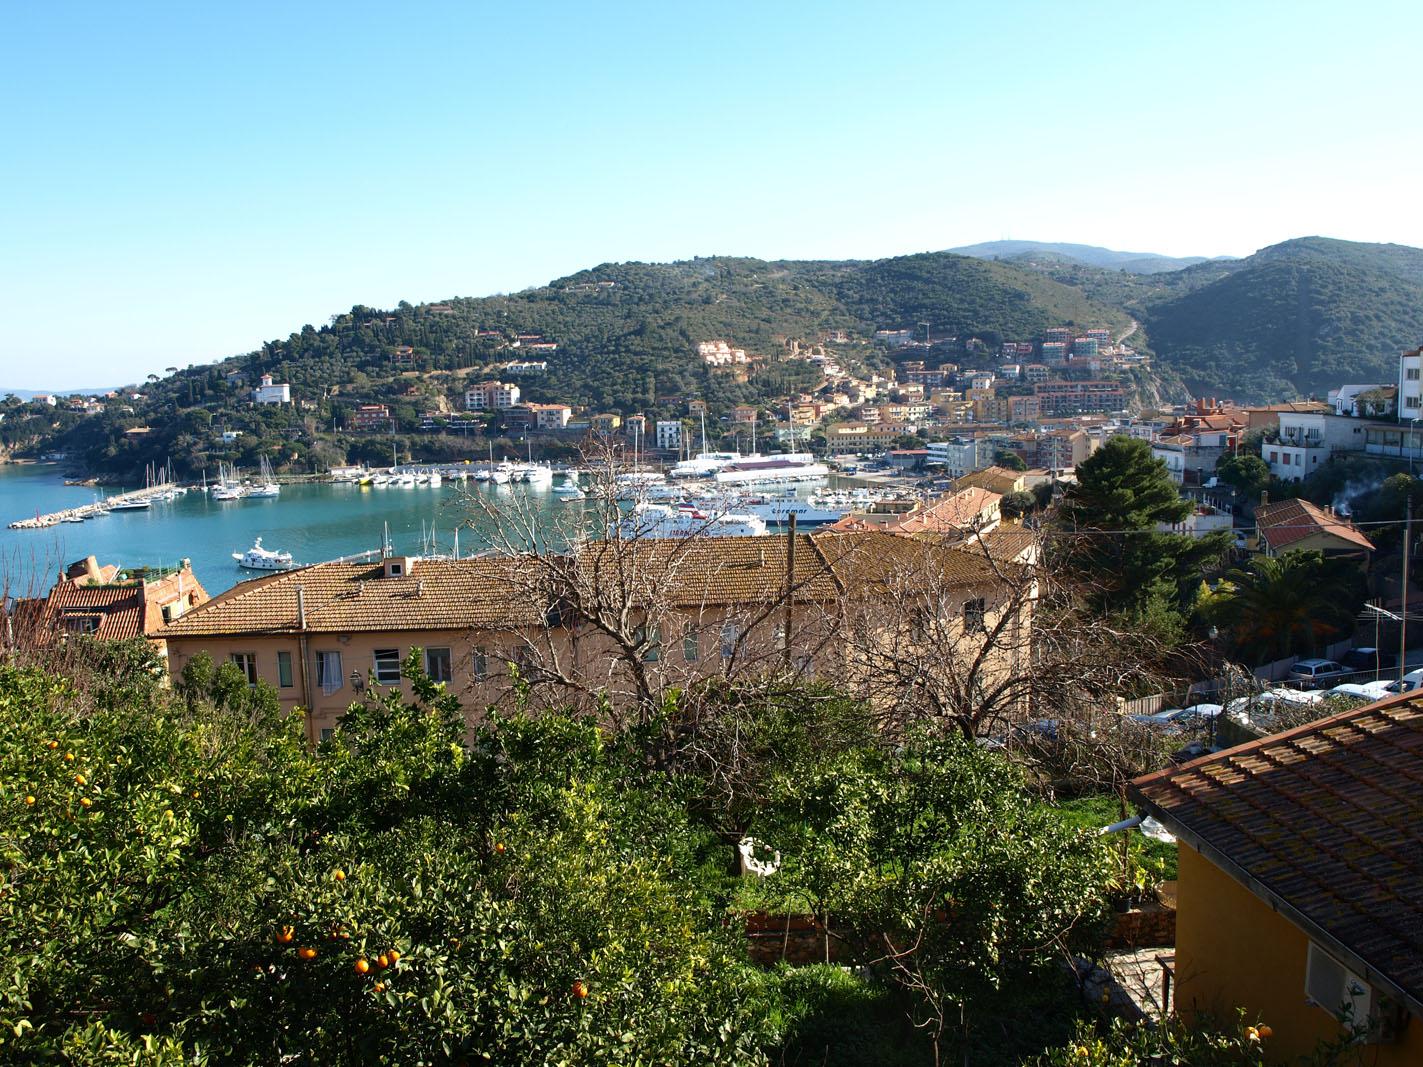 Porto S. Stefano - panoramio - Itto Ogami.jpg